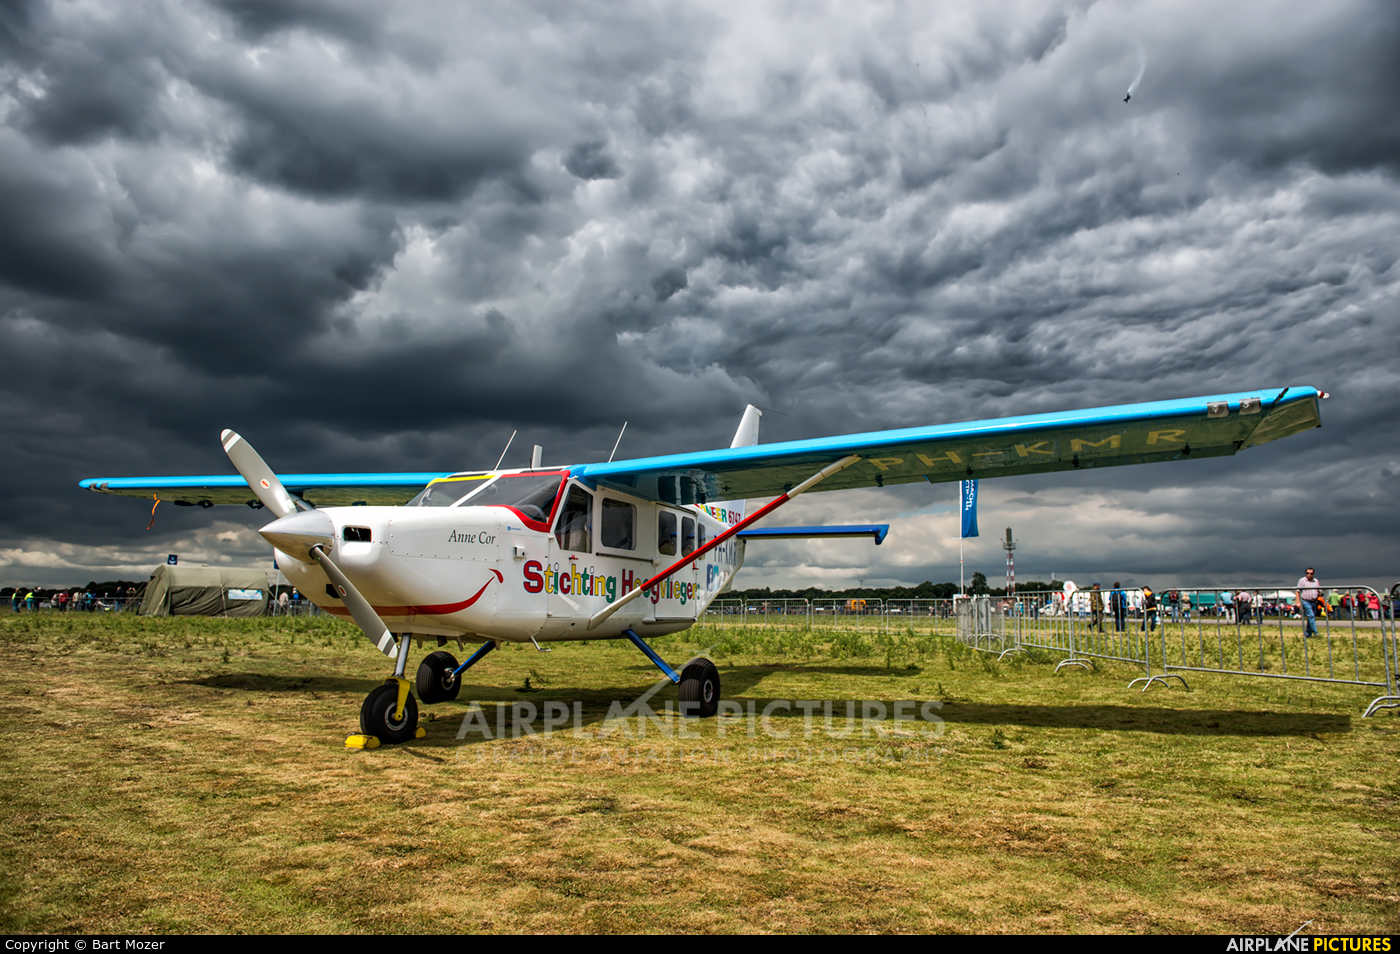 Stichting Hoogvliegers PH-KMR aircraft at Gilze-Rijen